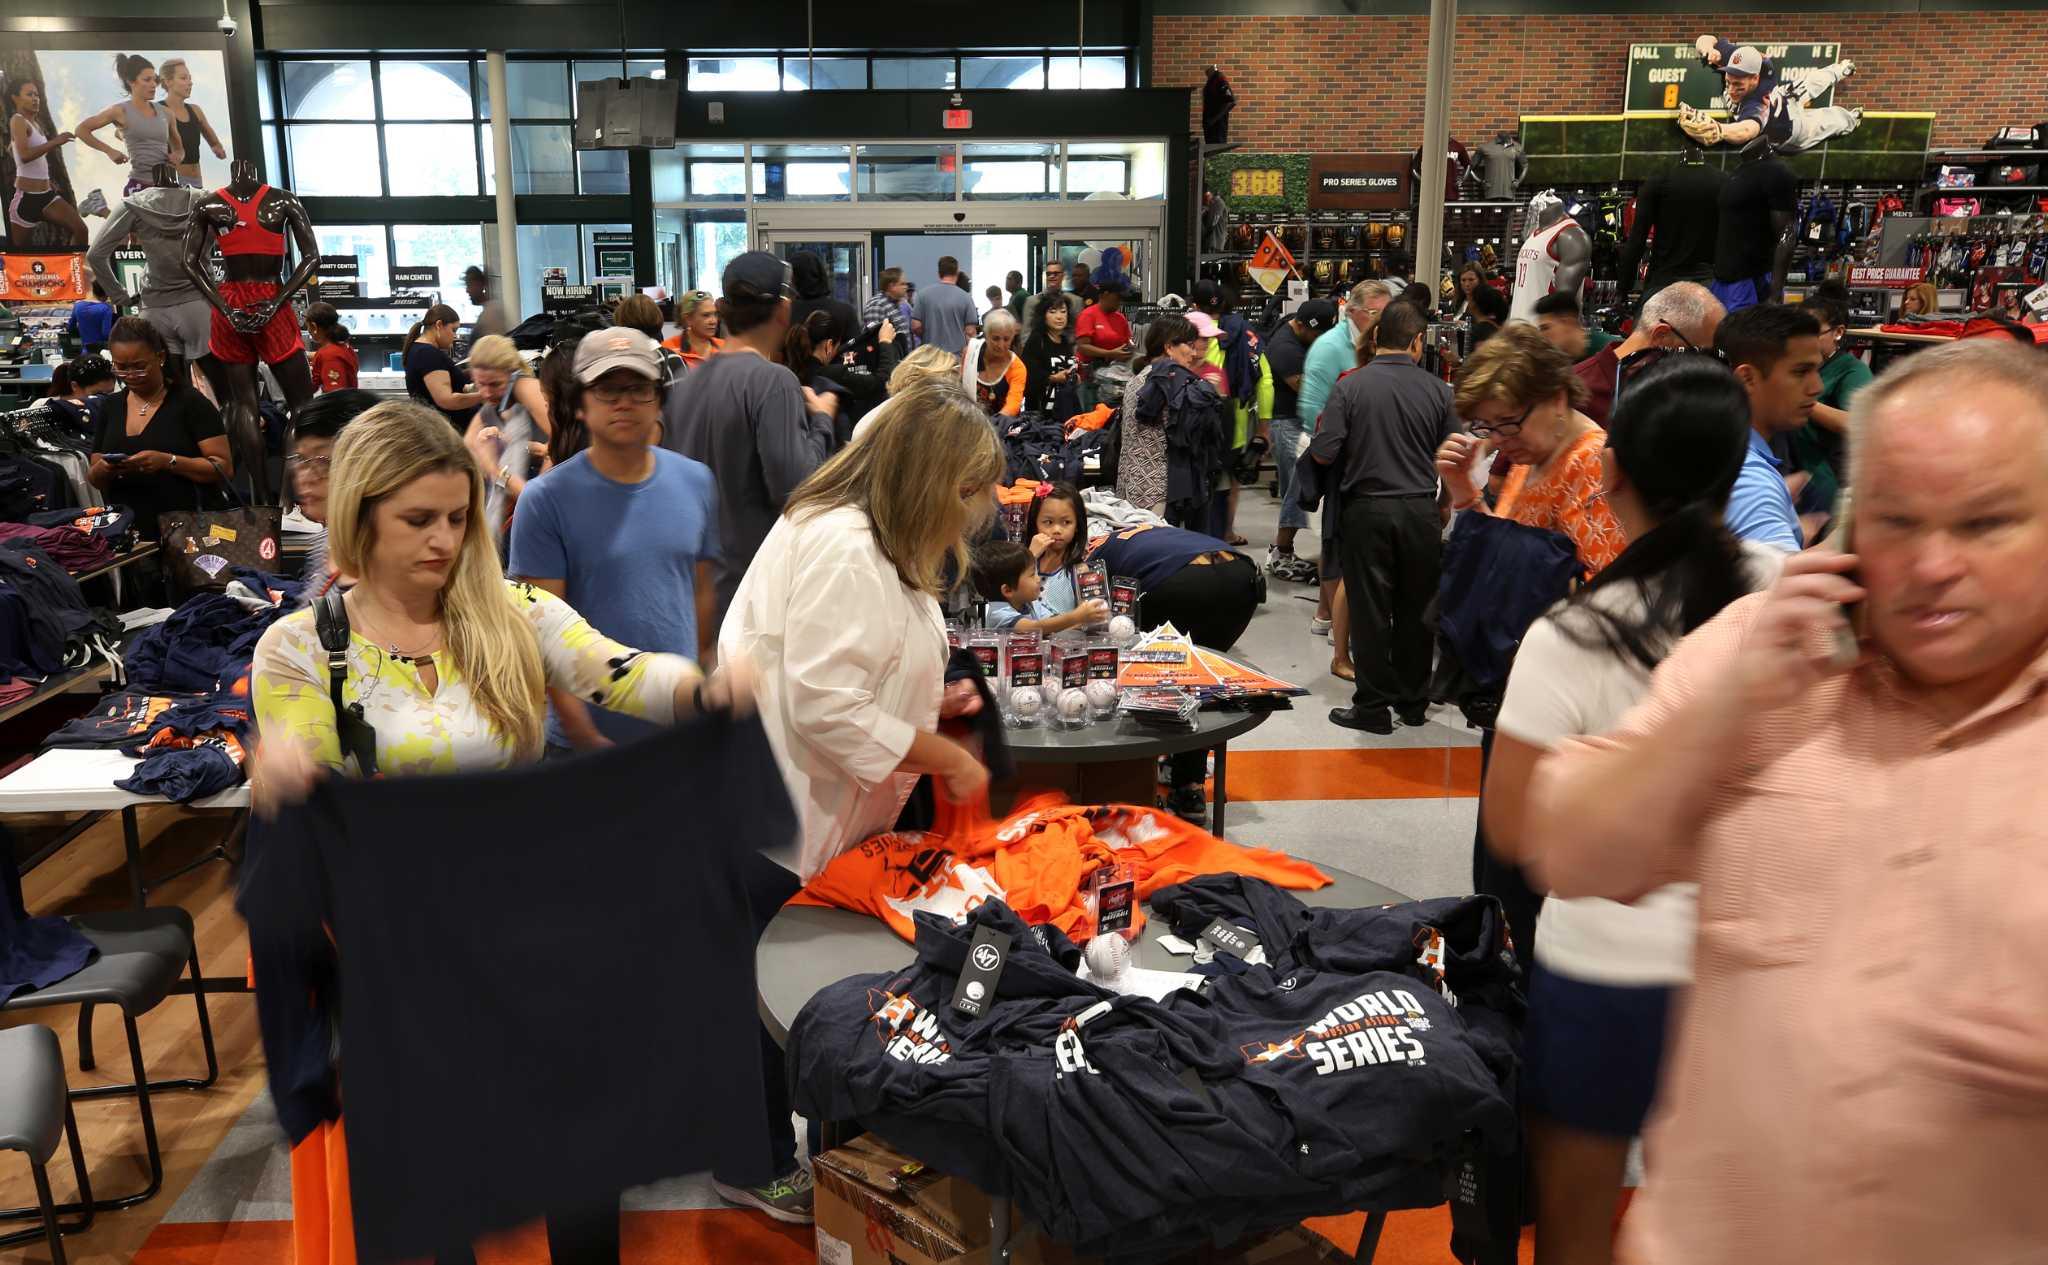 696bceefa Astros win turns Houston into a sea of orange as fans savor World Series  championship - HoustonChronicle.com